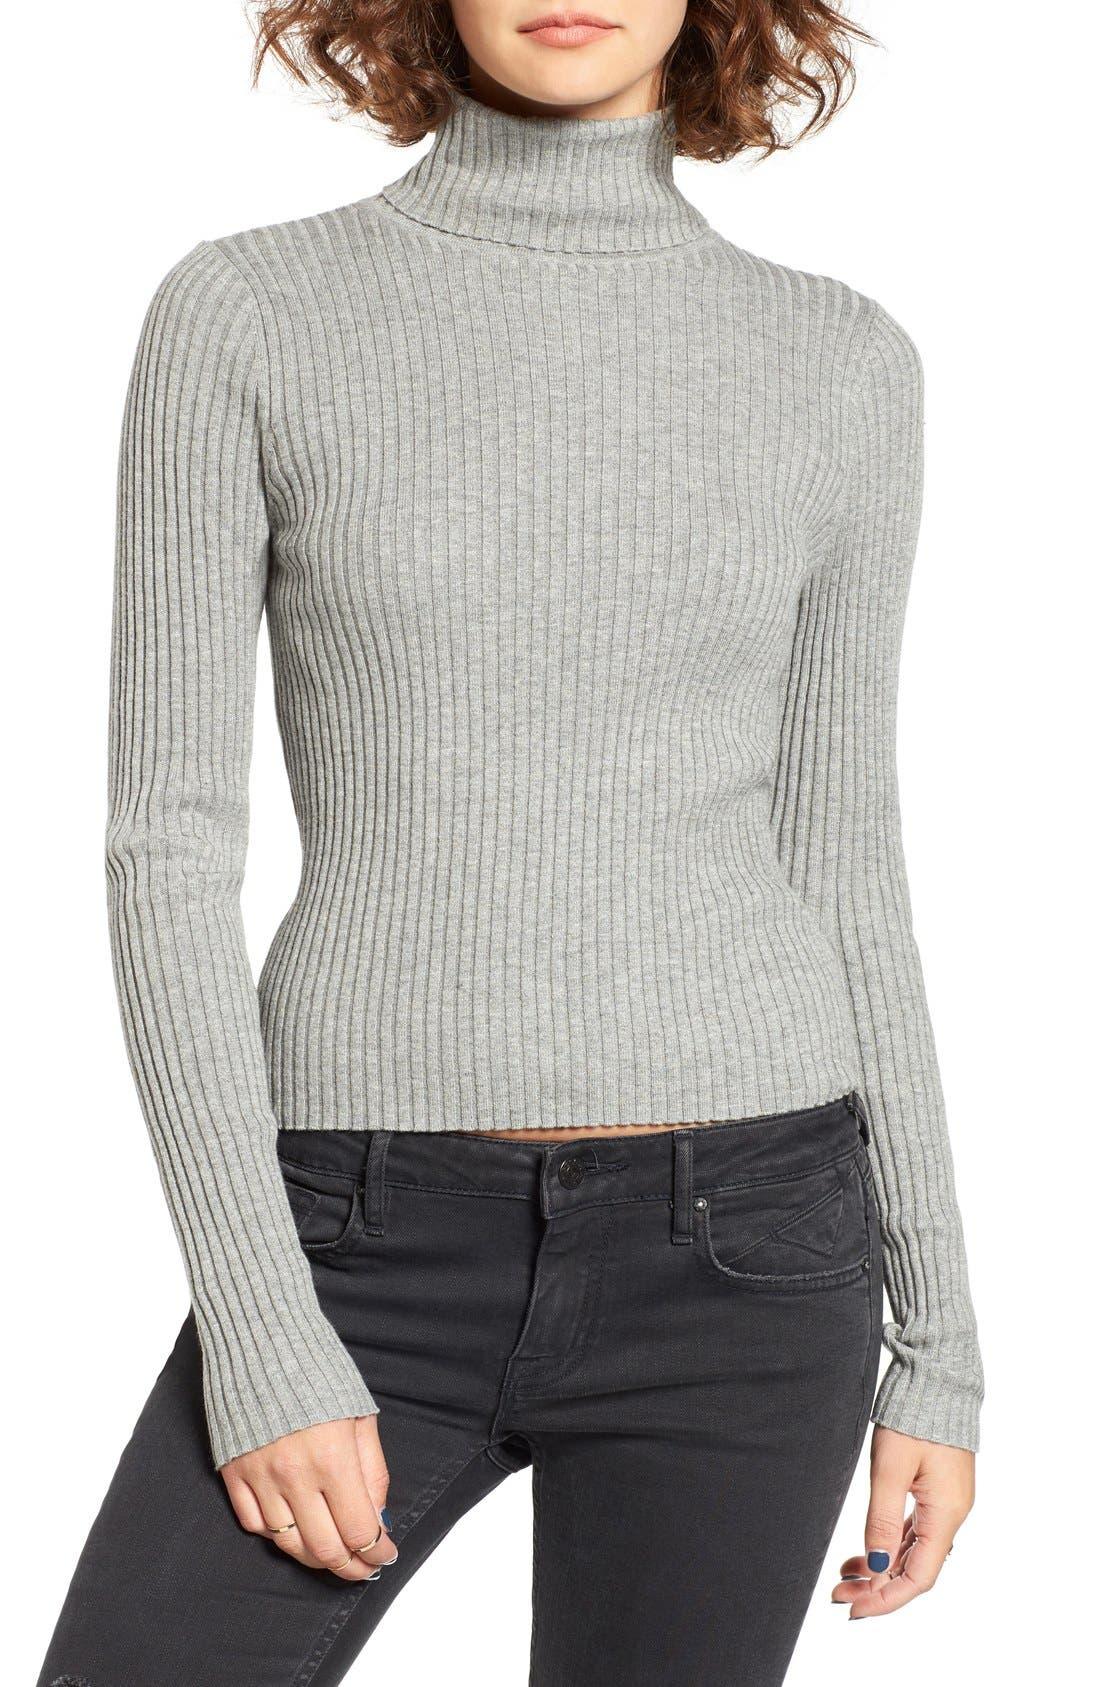 Alternate Image 1 Selected - BP. Rib Knit Turtleneck Sweater